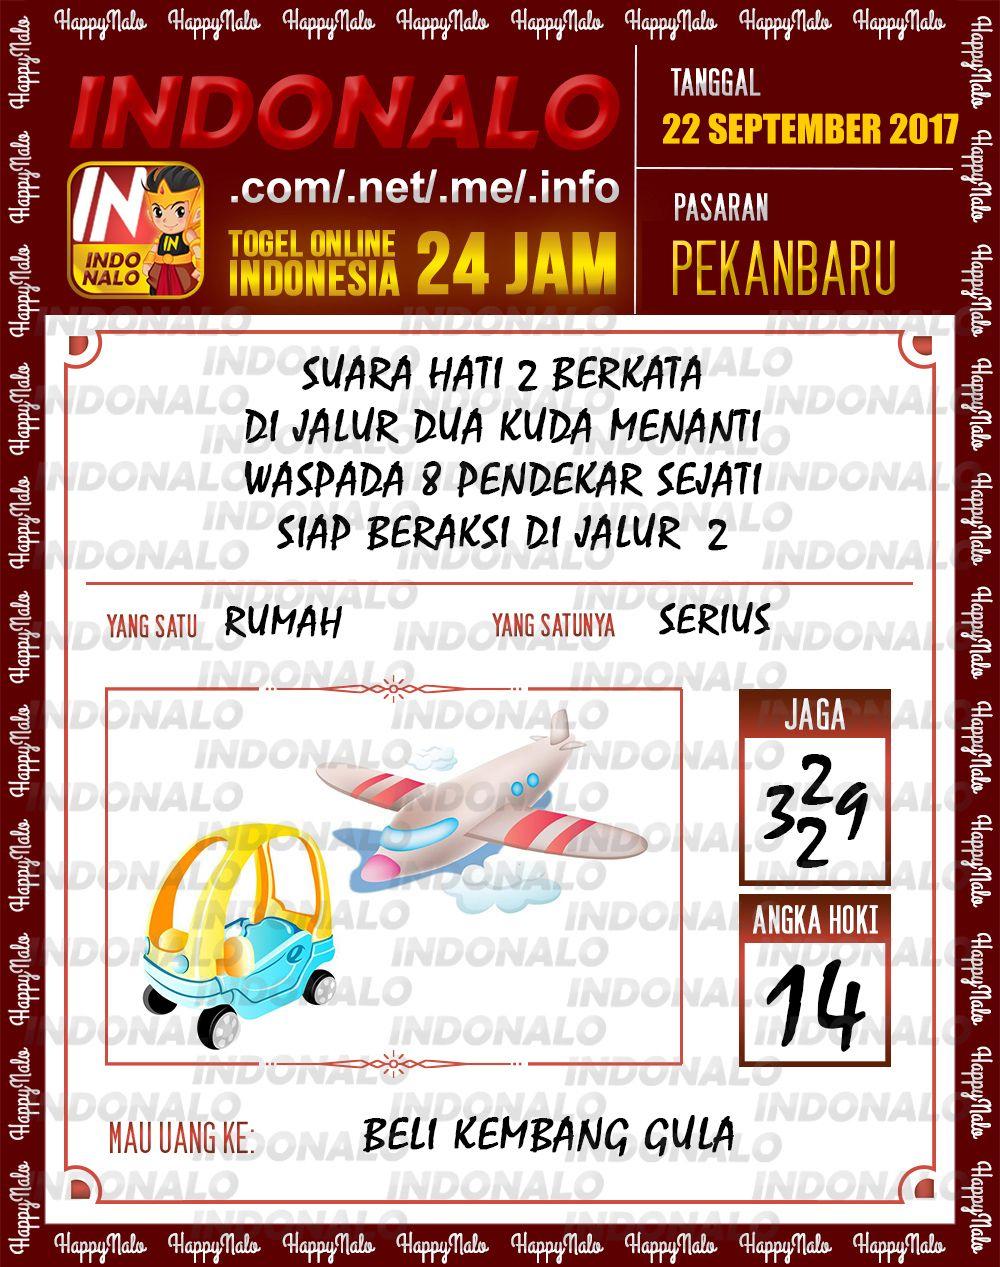 Colok 2D Togel Wap Online Indonalo Pekanbaru 22 September 2017